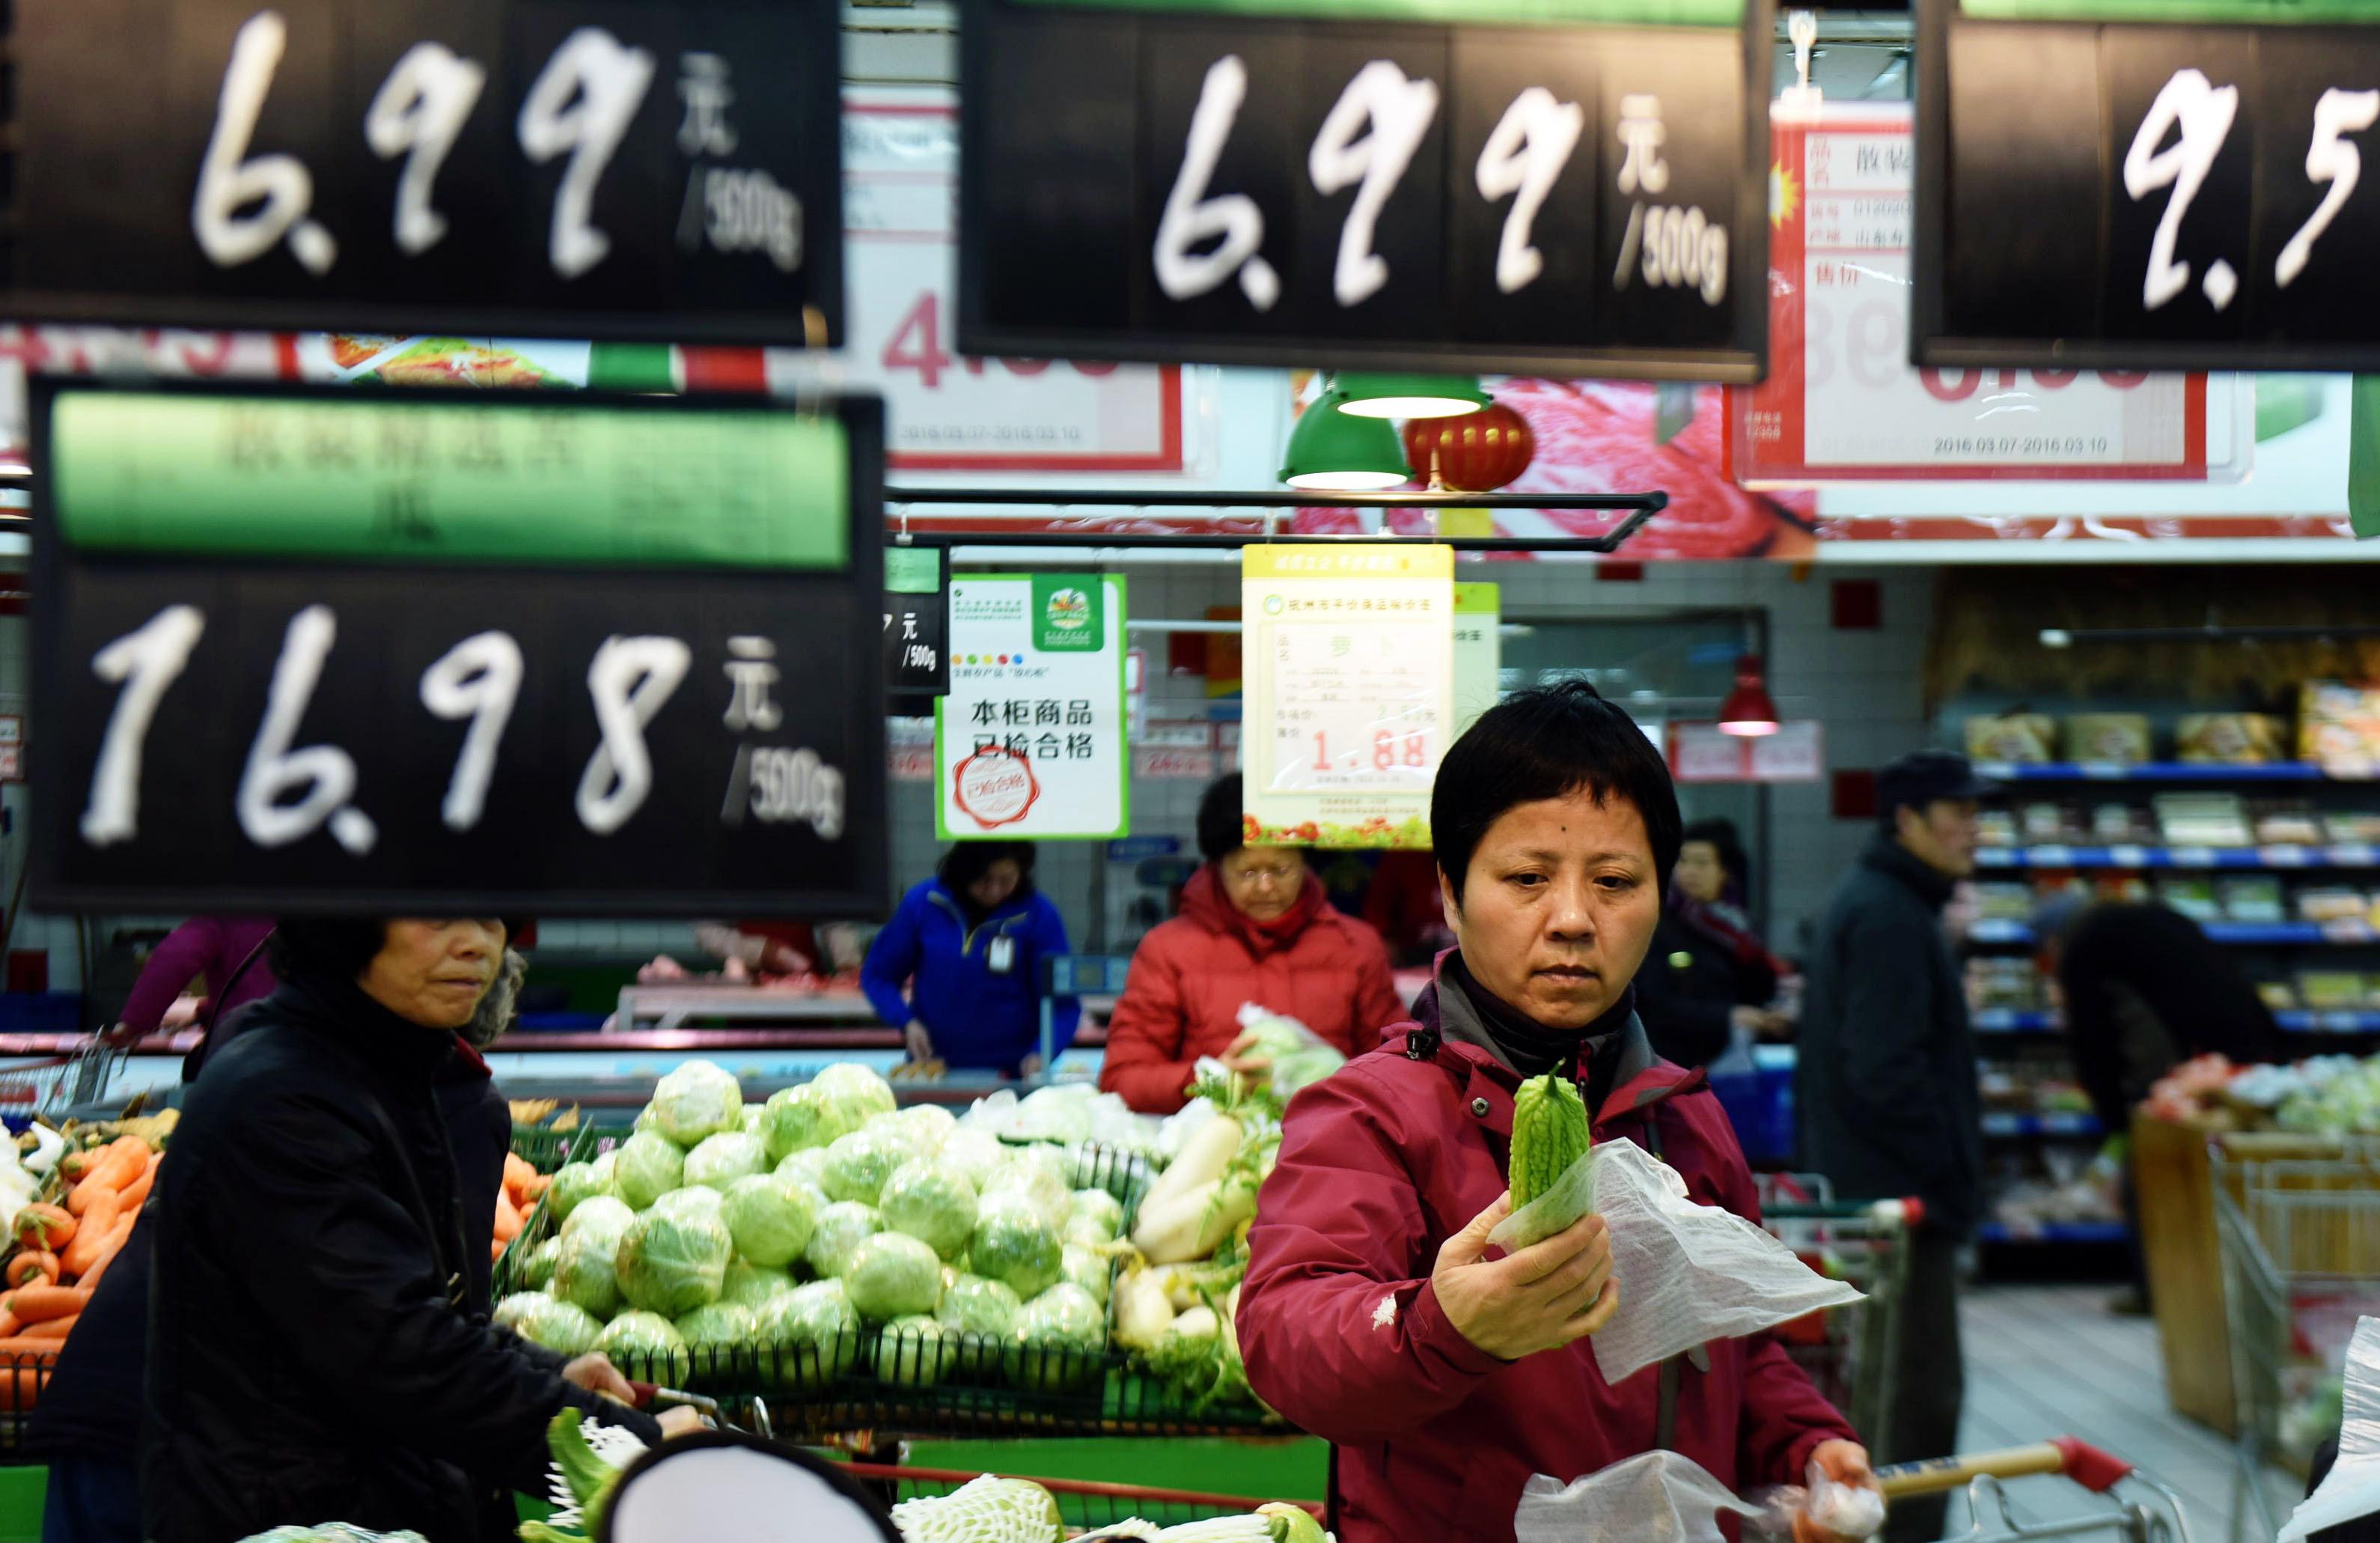 On-the-Ground Data Confirms China's Economic Rebound Scenario